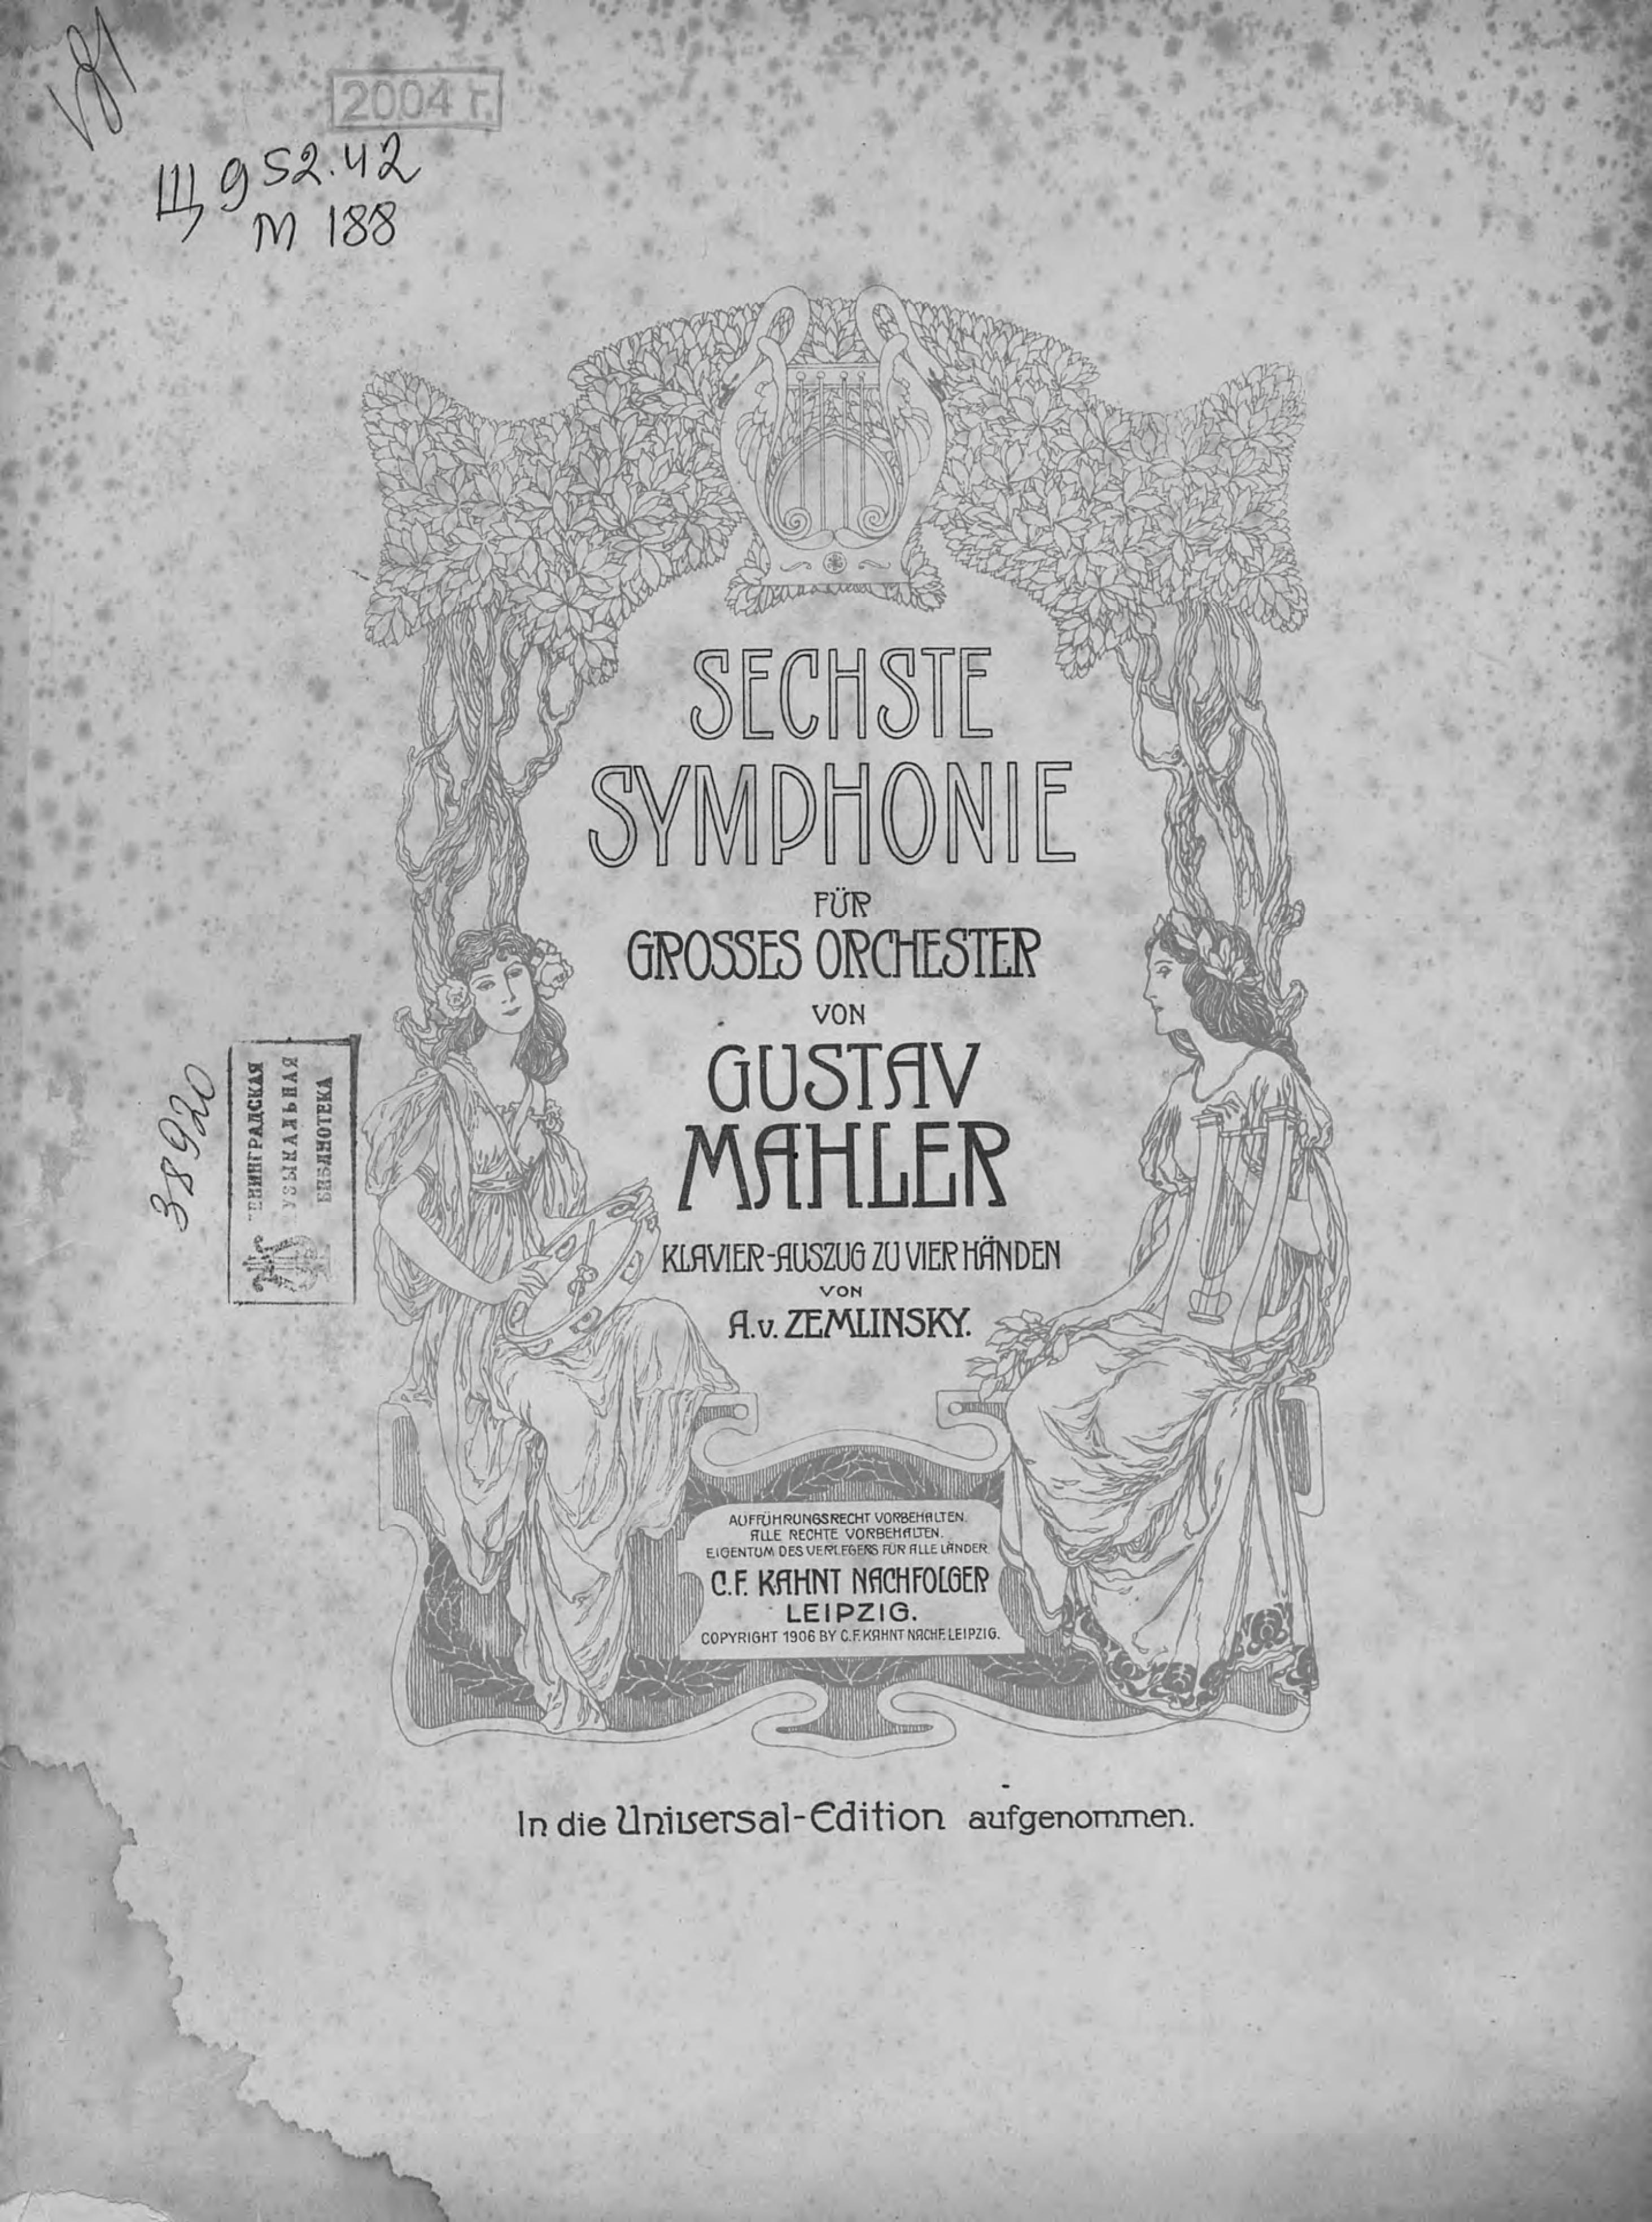 Густав Малер Sechste symphonie fur grosses orchester akademisk orkester akademisk orchester dvorak requiem 2 cd